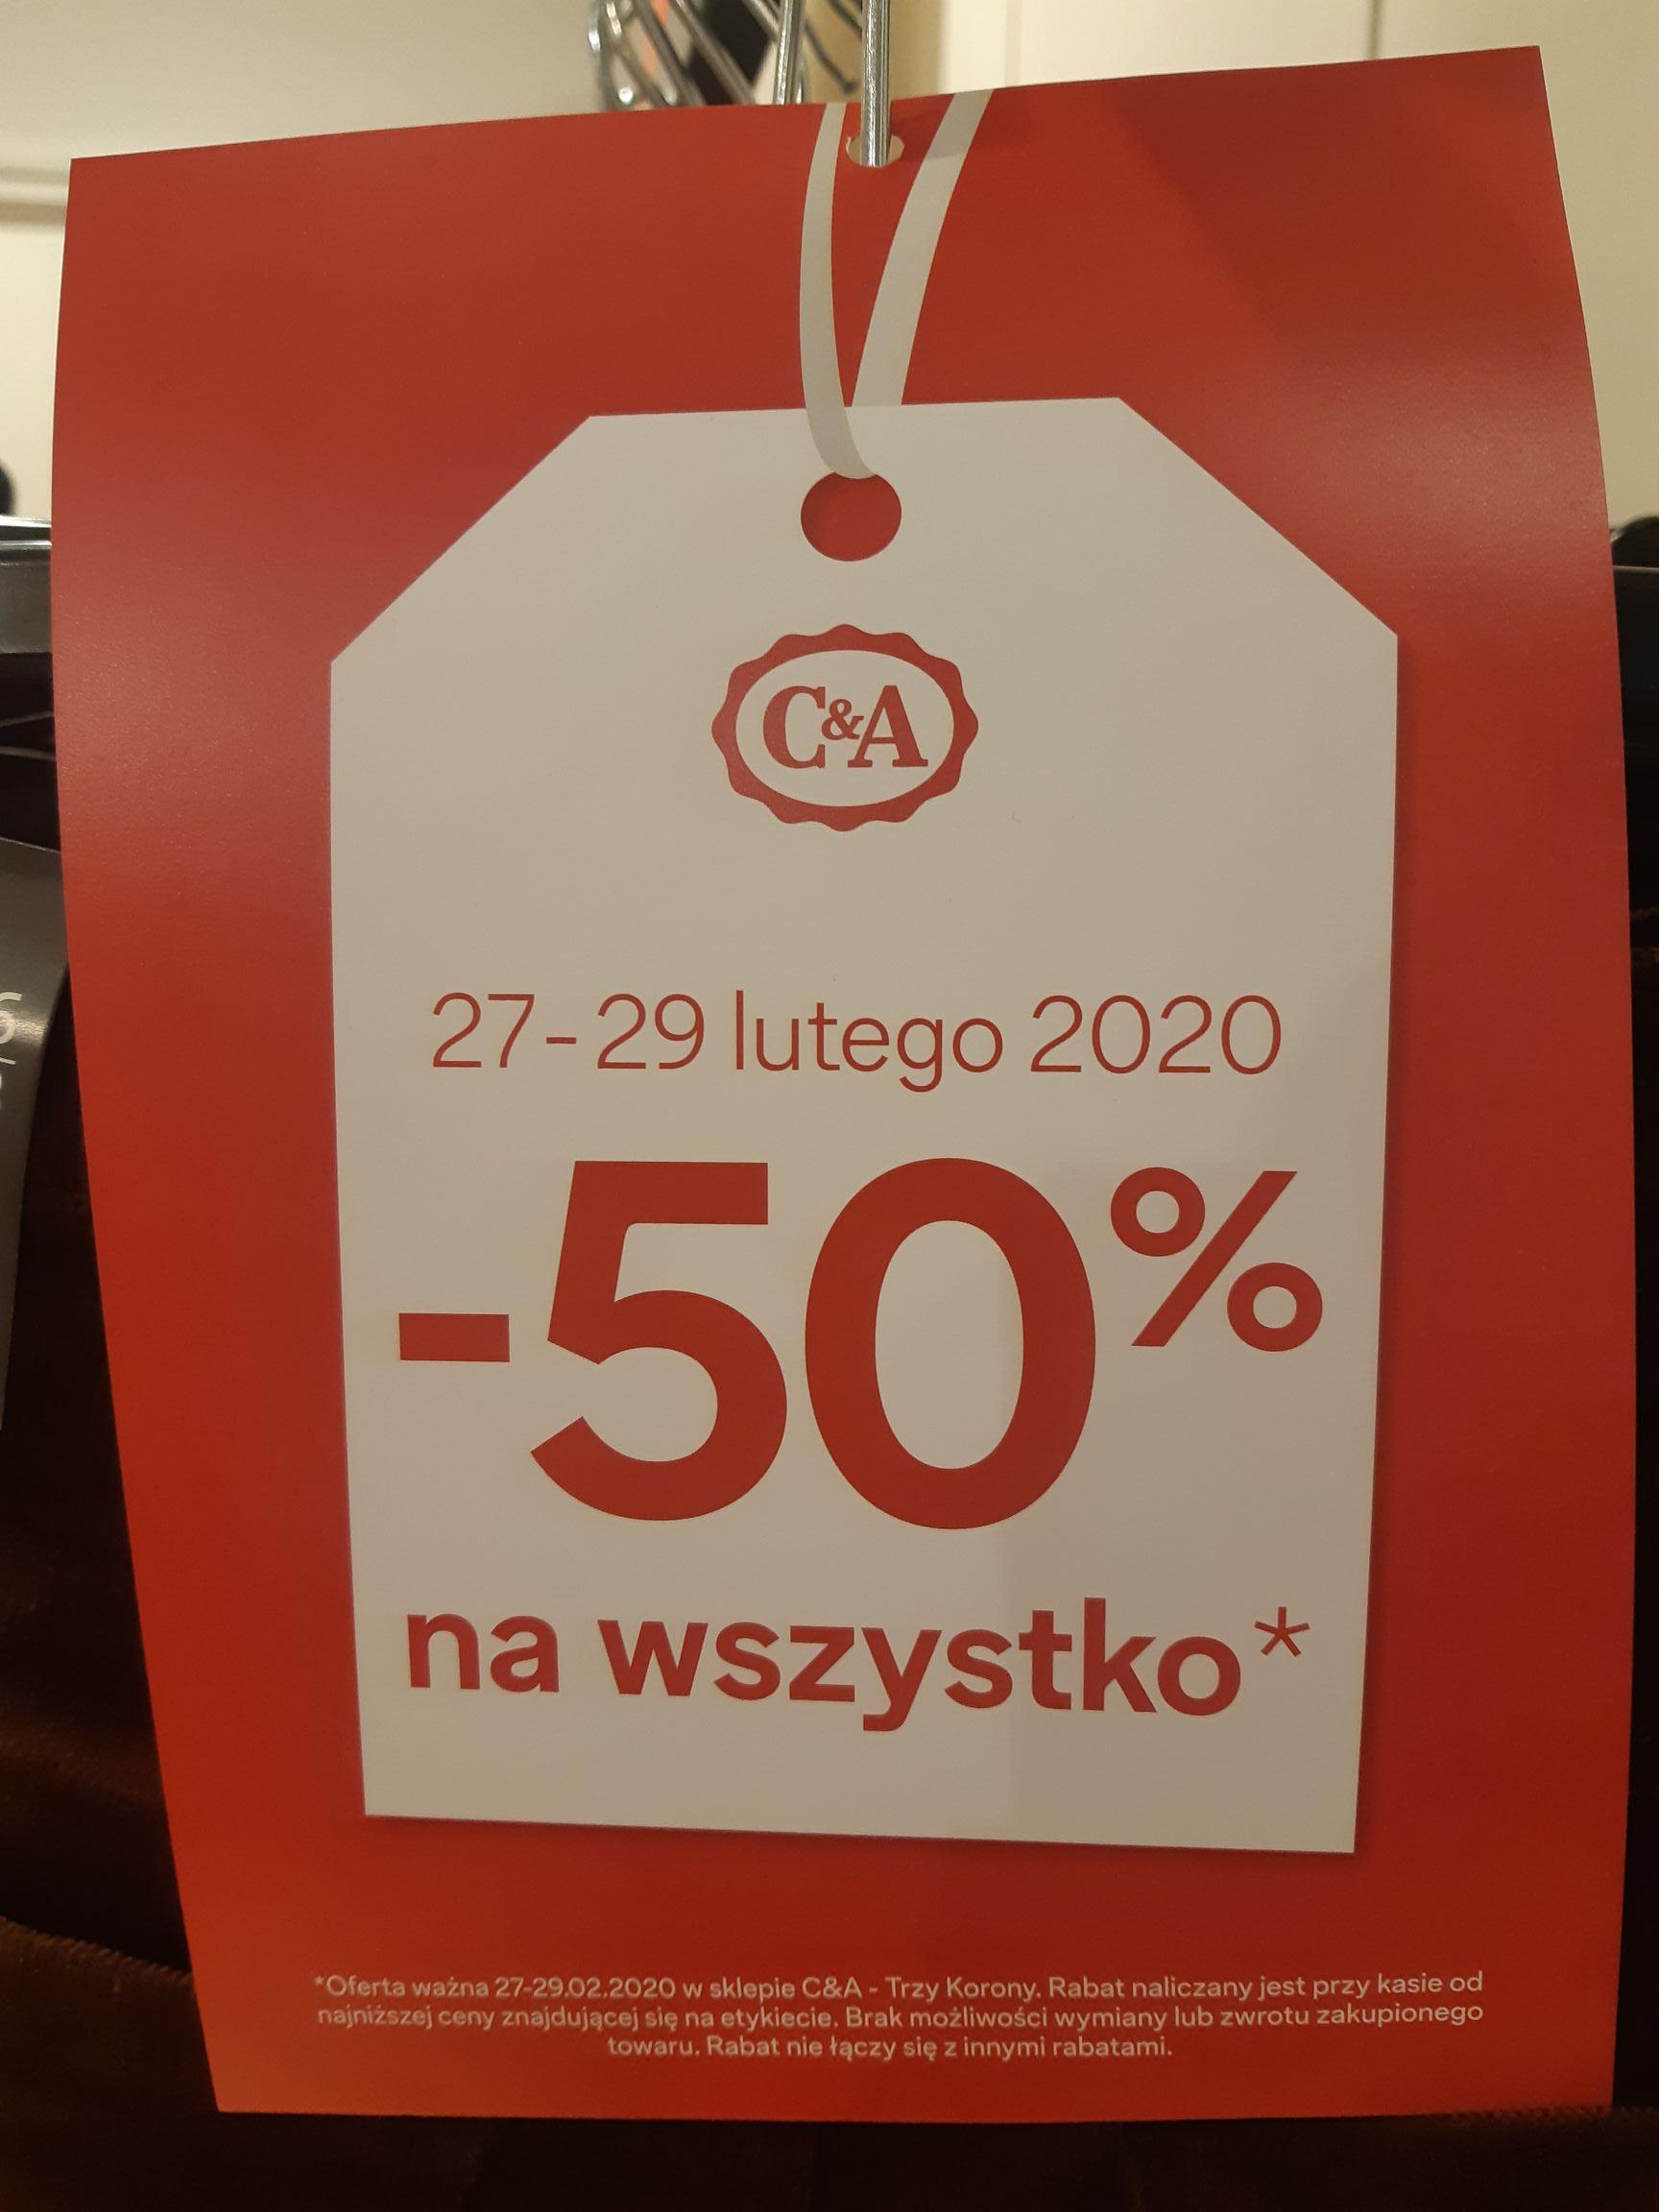 8a promocje i rabaty w 2020 Pepper.pl